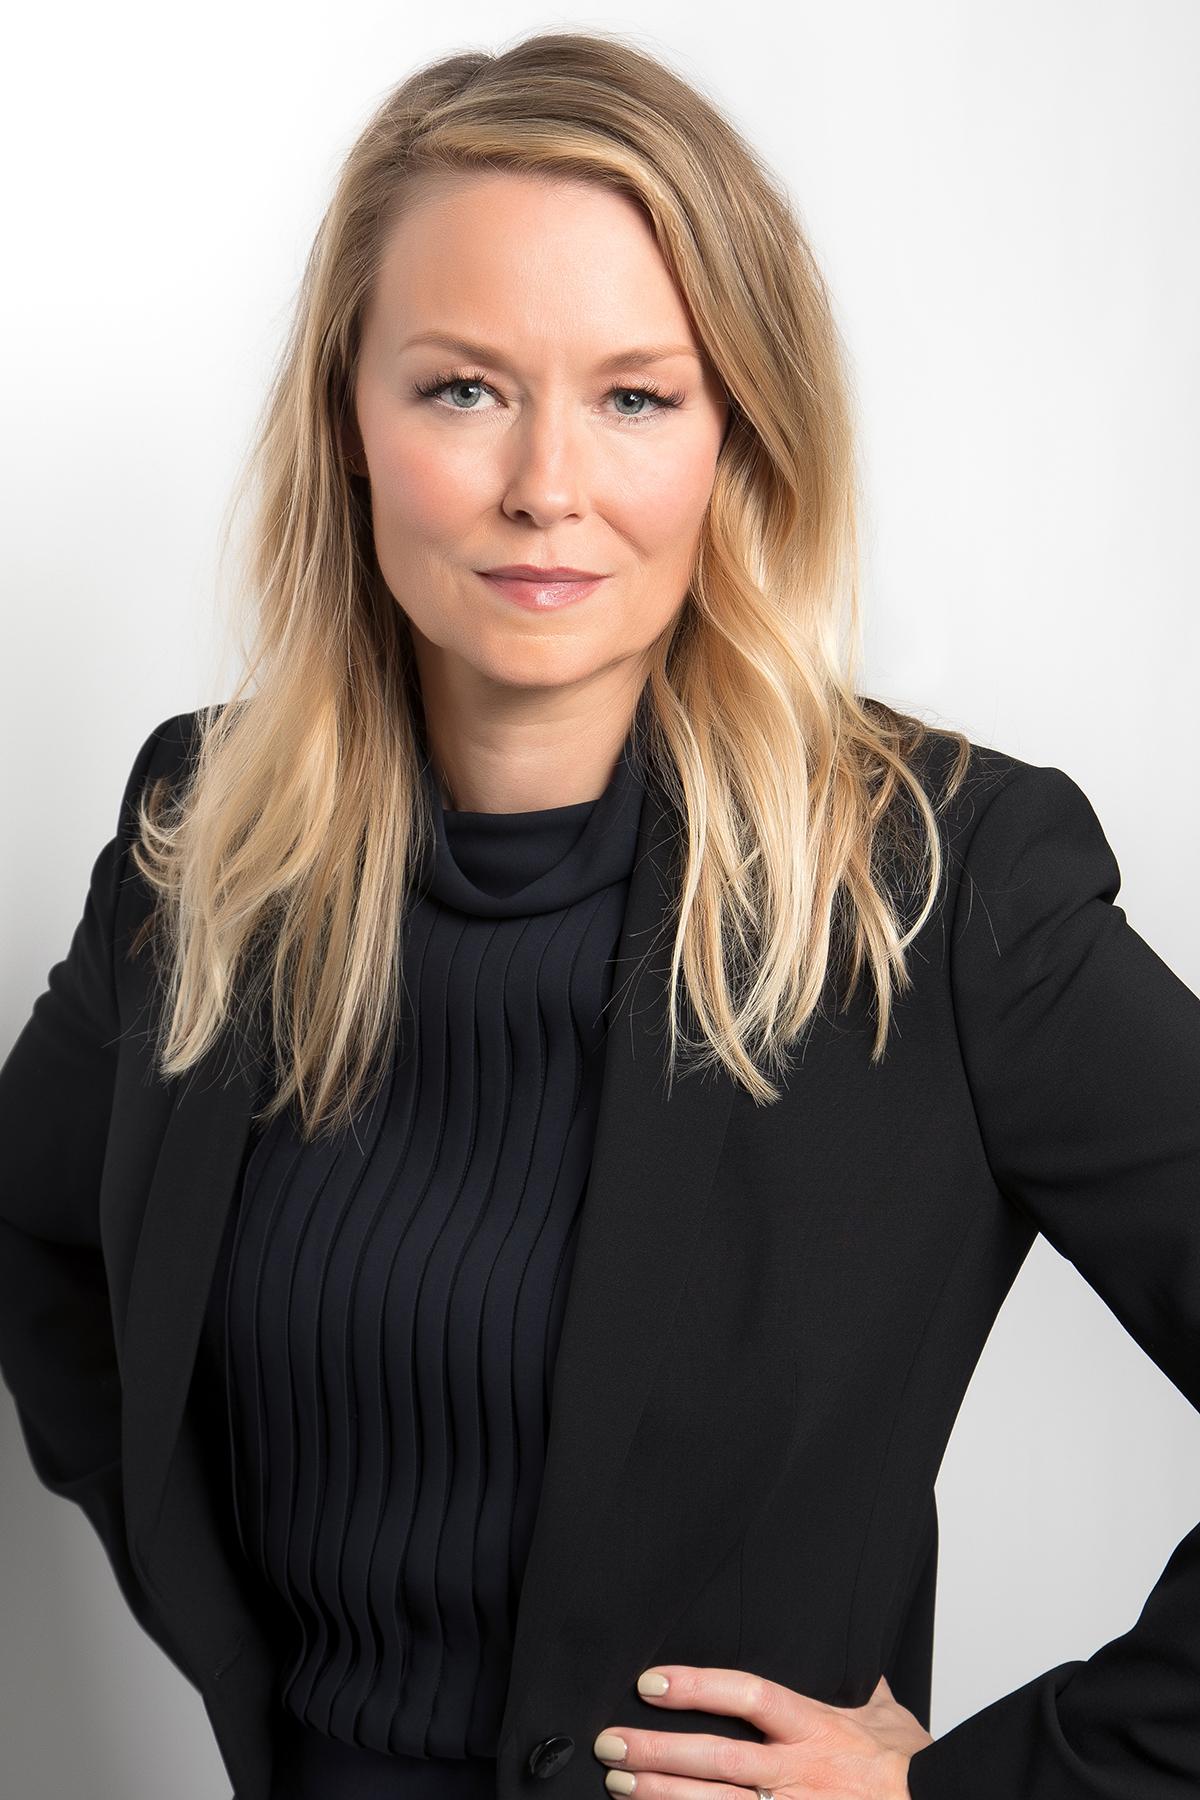 Christina L. Smith